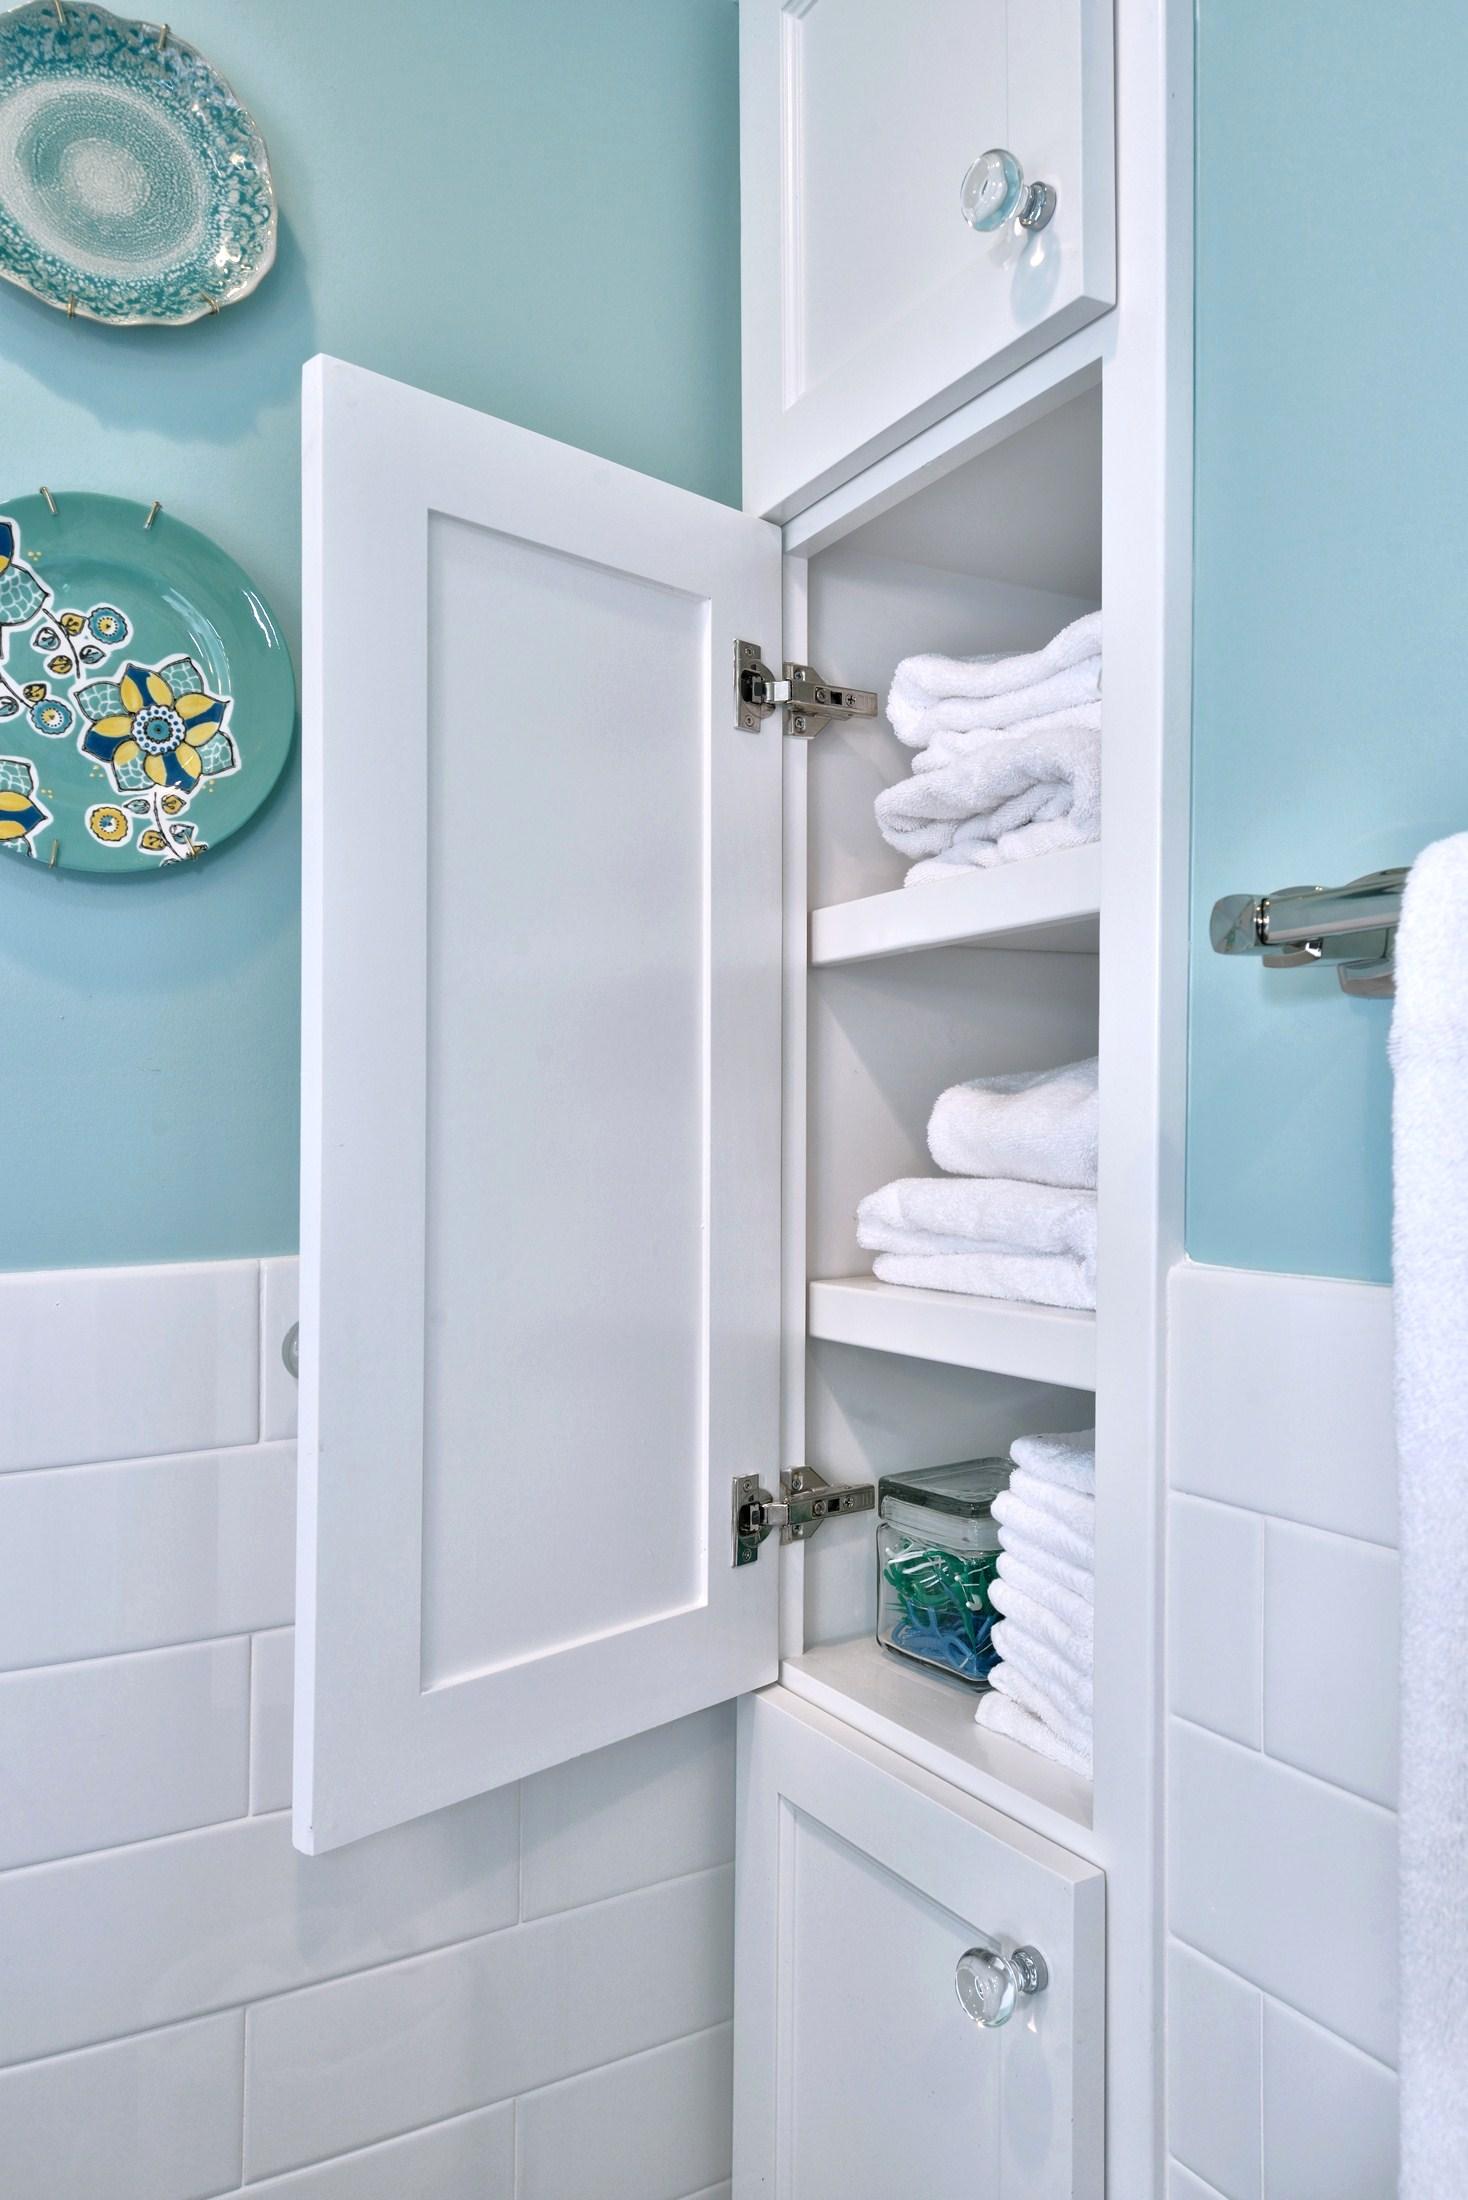 11 Creative Ways To Make A Small Bathroom Look Bigger Designed